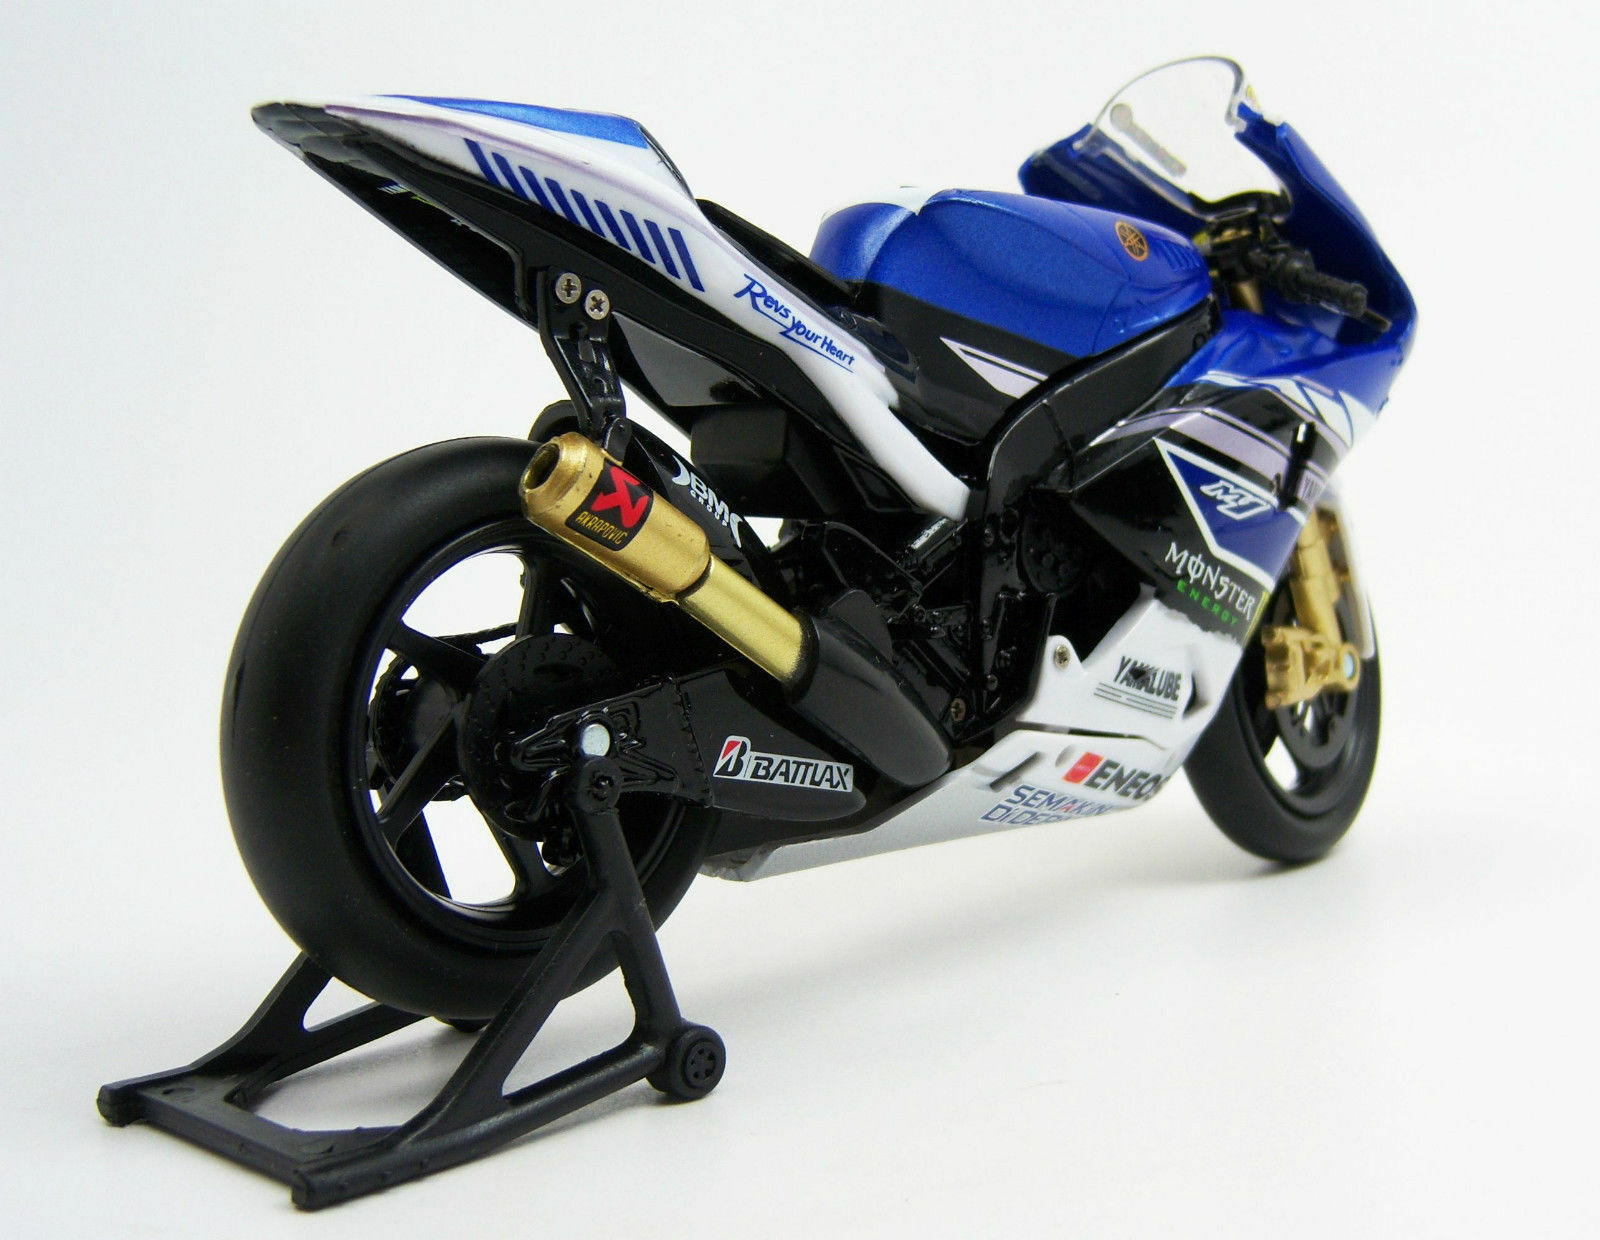 Nuevo Valentino Rossi montruo MODELO 2013 1 12 Escala YAMAHA YAMAHA YAMAHA MOTO model-high 632f9a